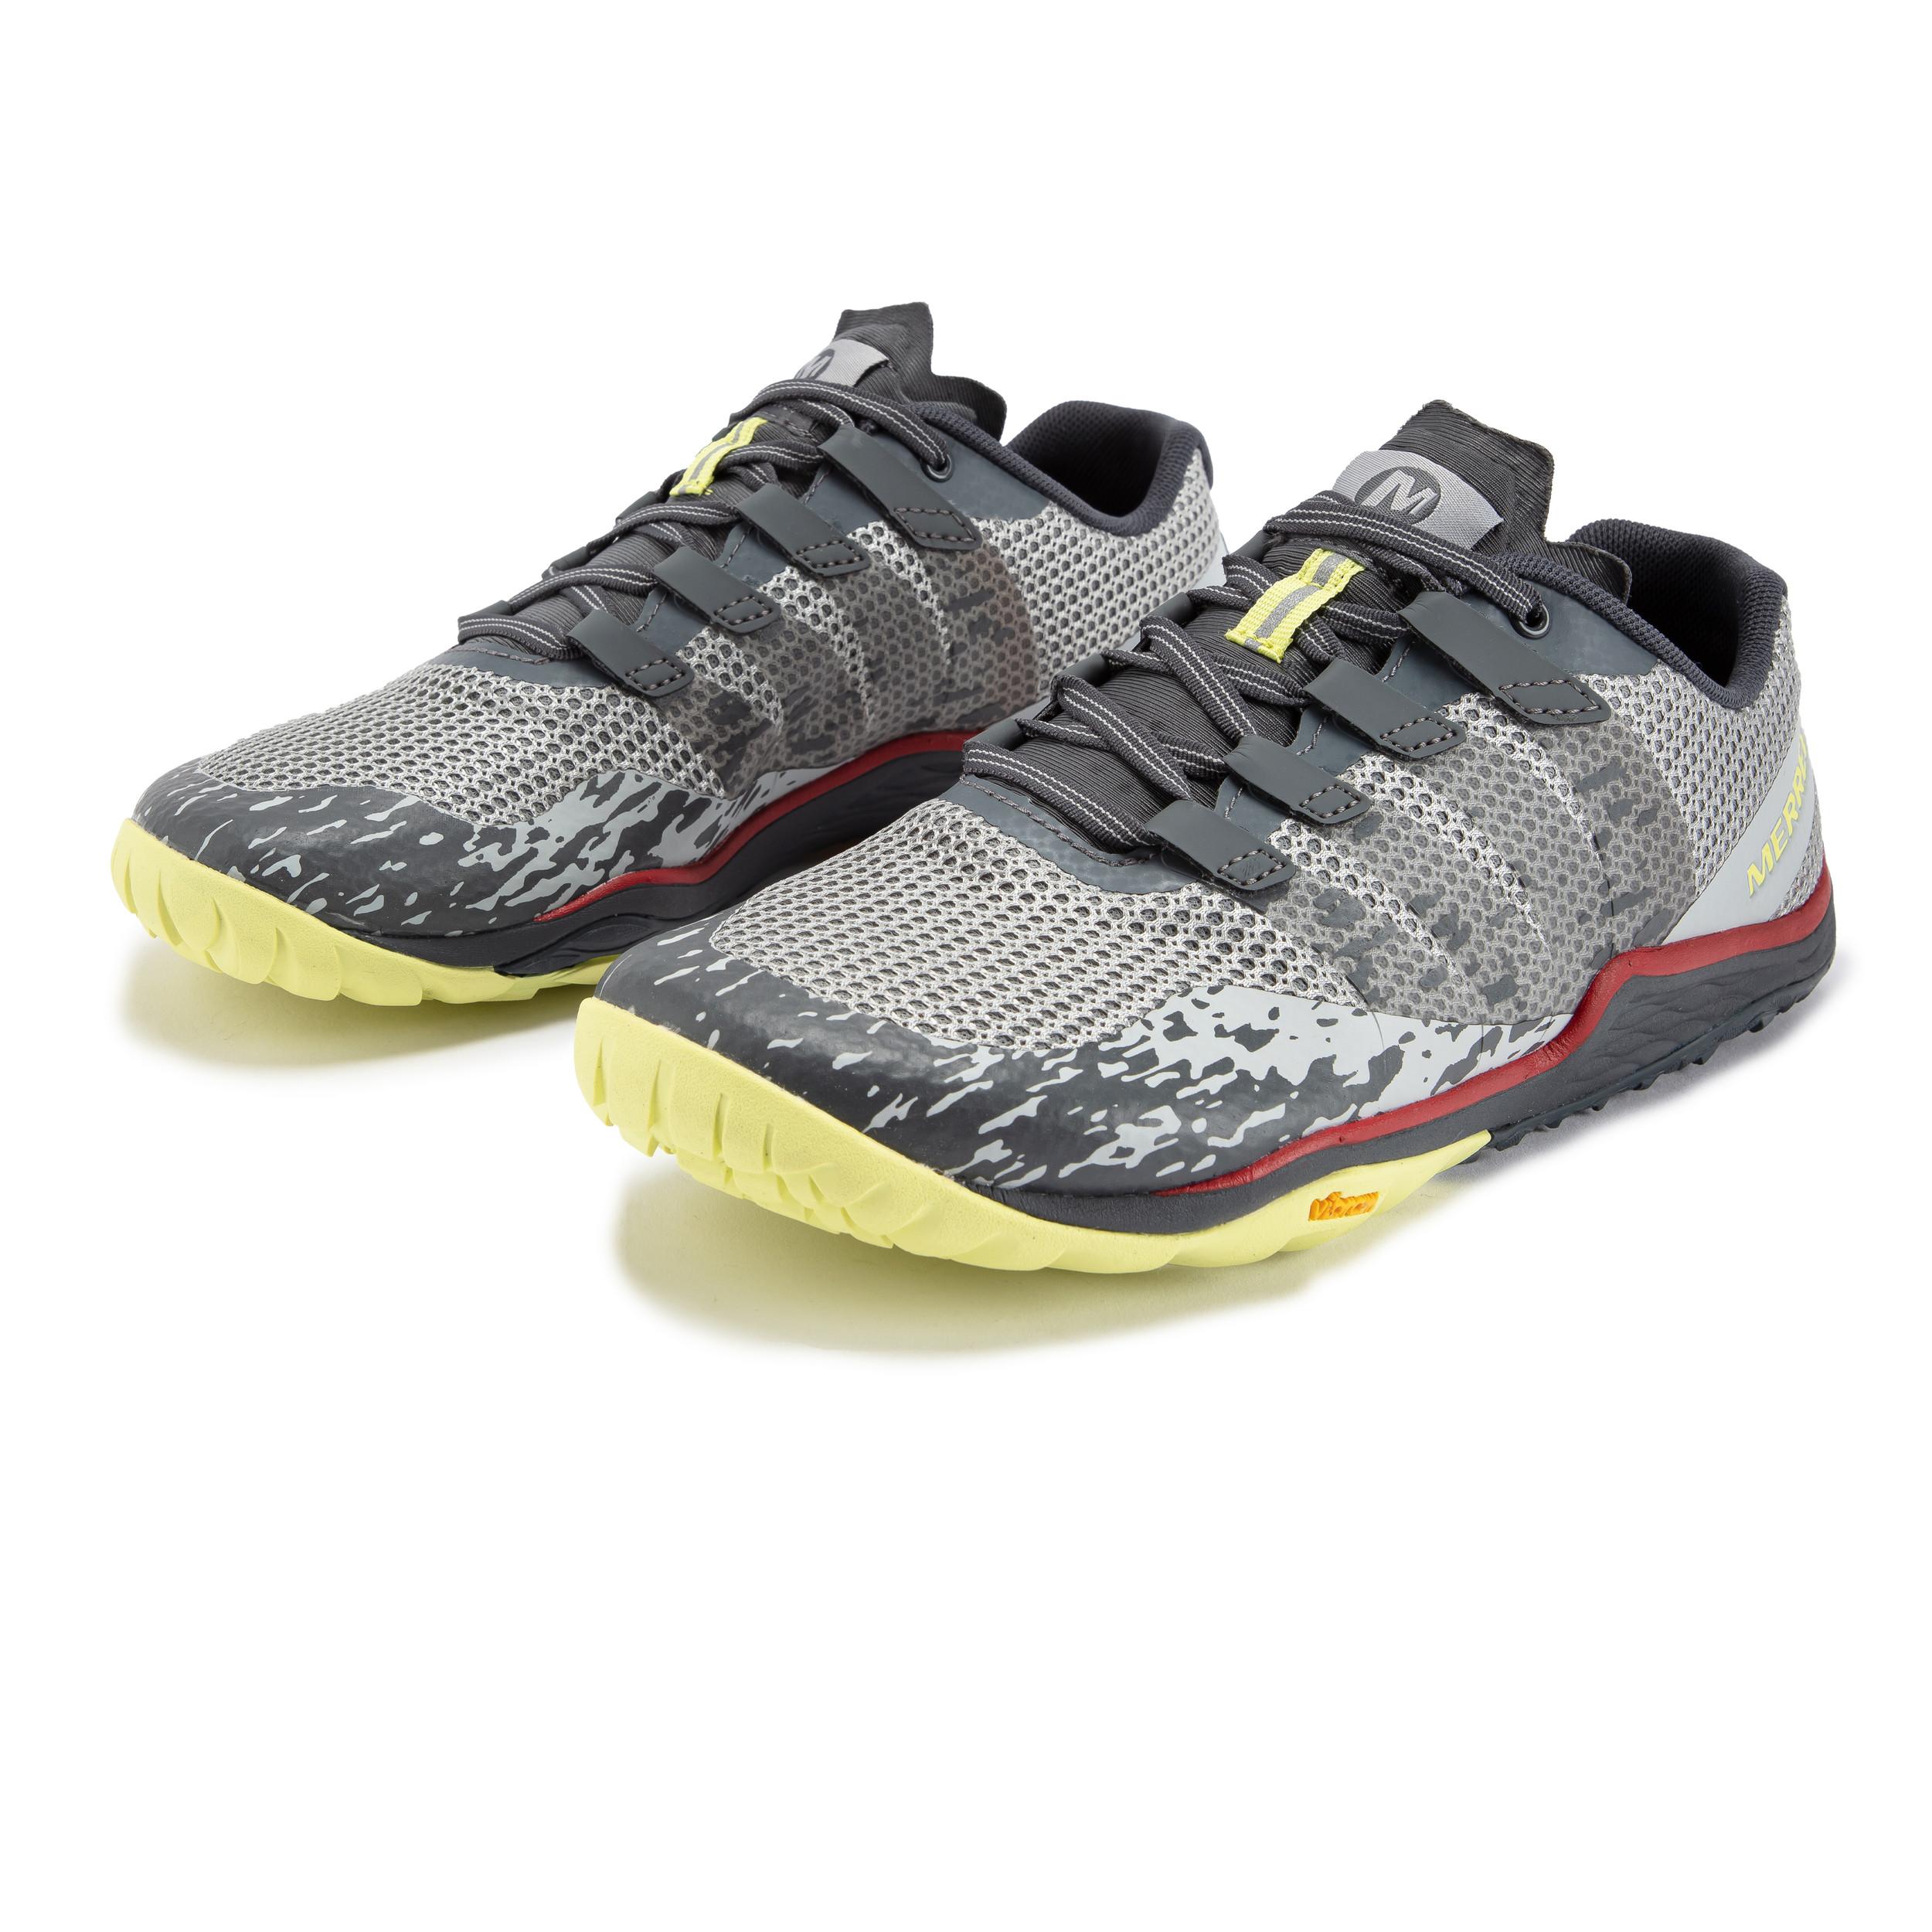 Merrell trail glove 5 zapatillas de trail running